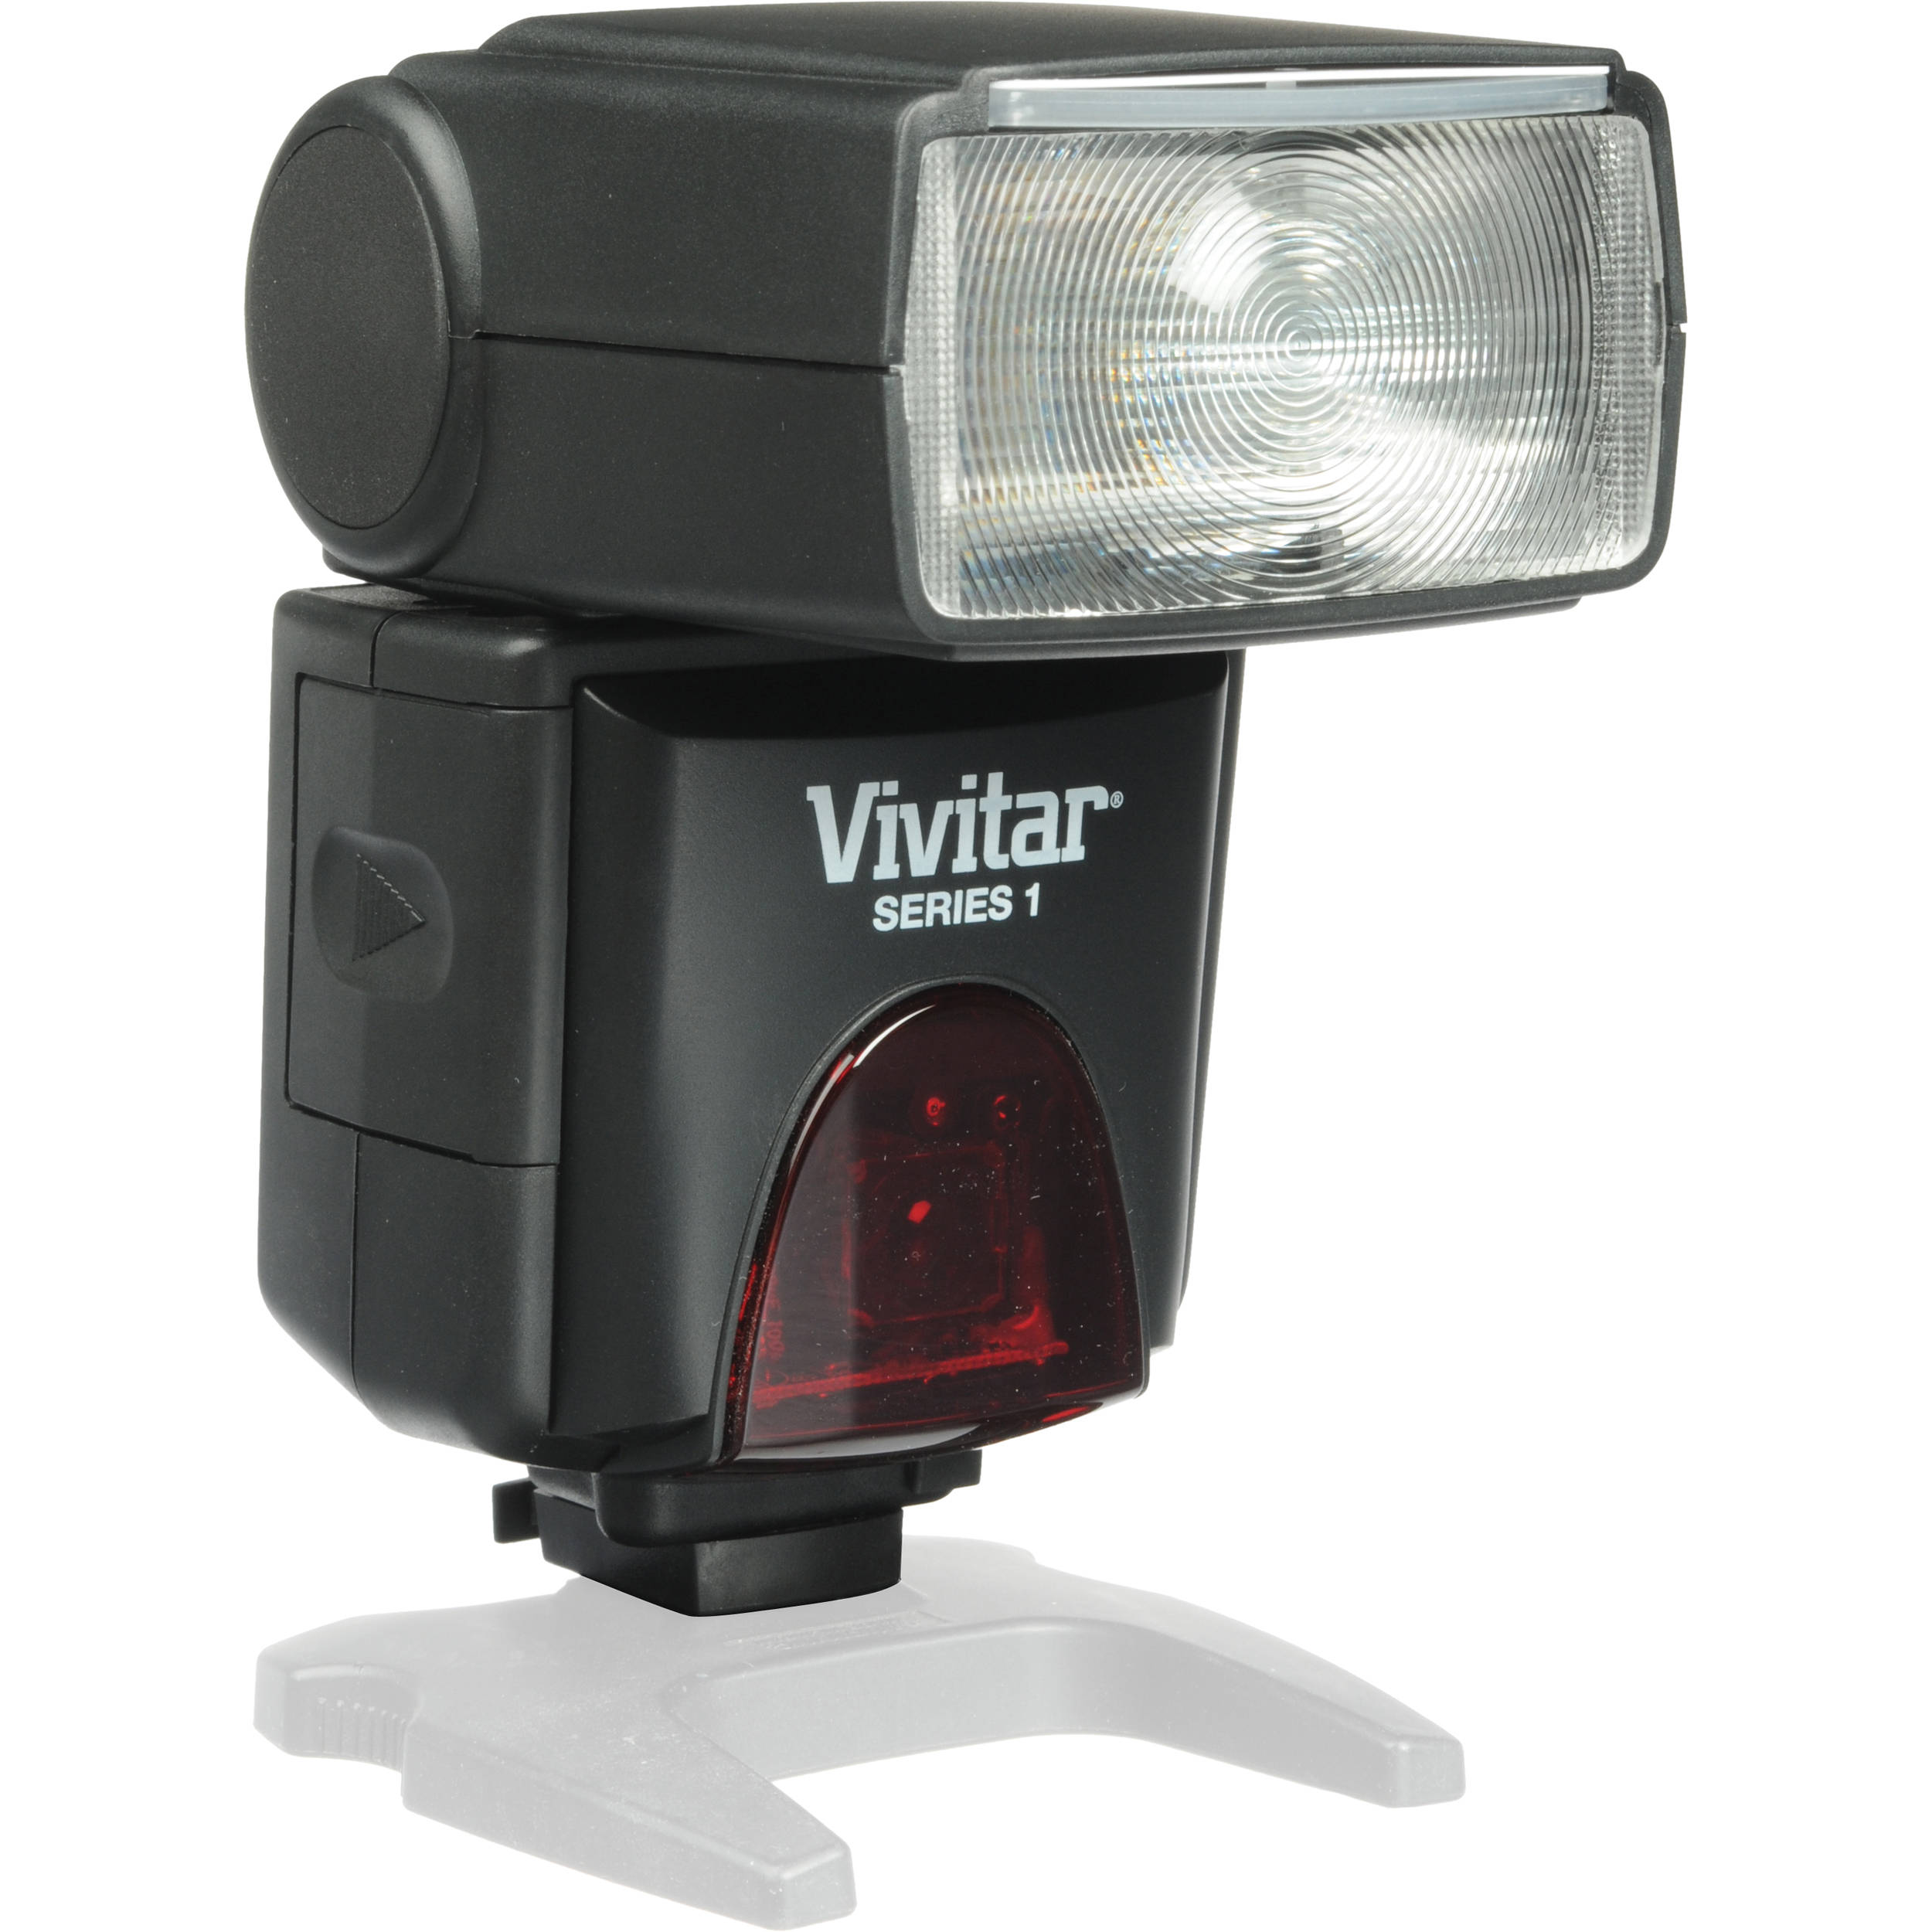 Great Canon Cameras Used Vivitar Series Power Zoom Af Flash Vivitar Series 1 500pz Vivitar Series 1 28 105mm Vivitar Series Power Zoom Af Flash dpreview Vivitar Series 1